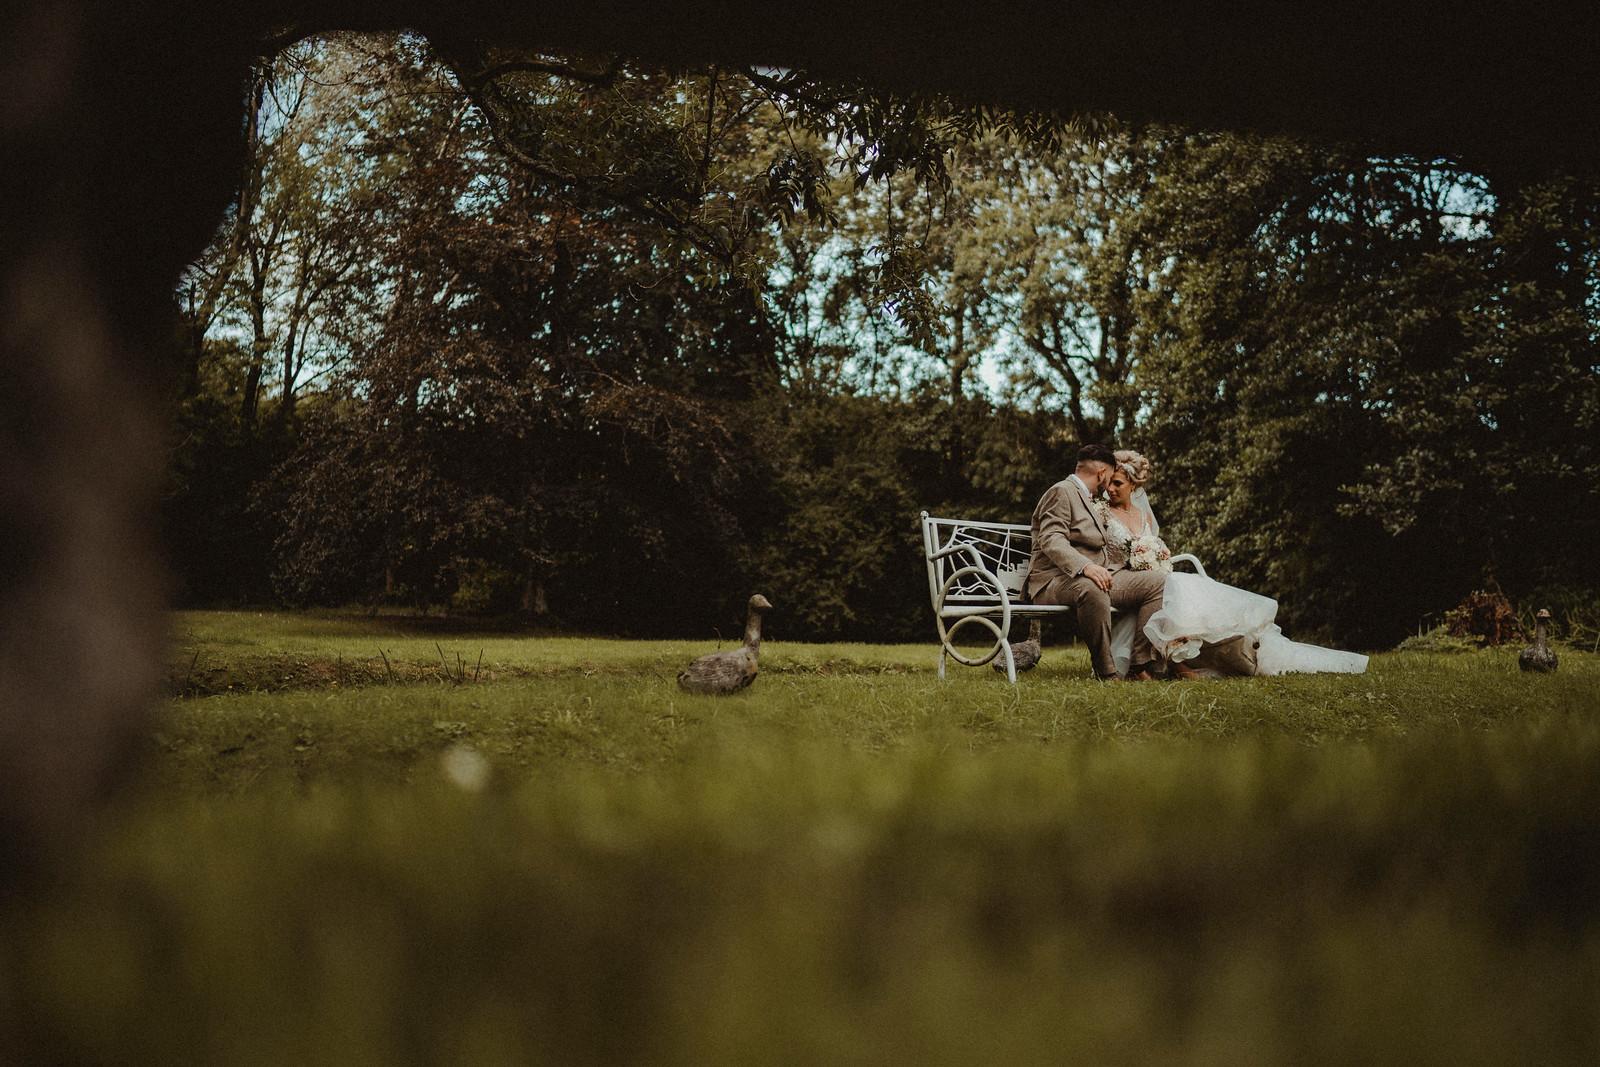 Stunning Wedding Photo of Bride and Groom